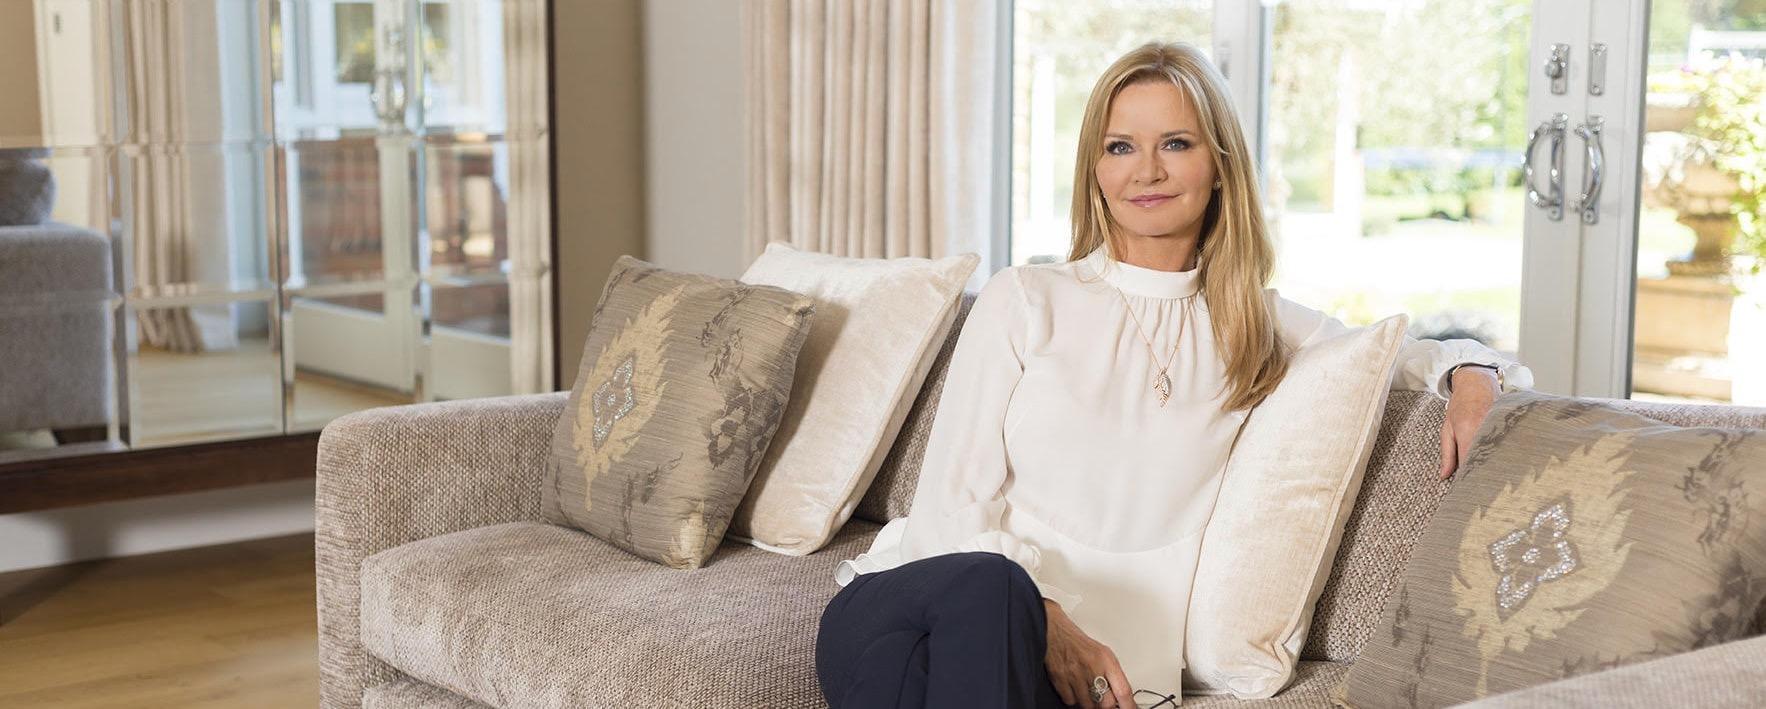 Elizabeth hammond sitting on sofa